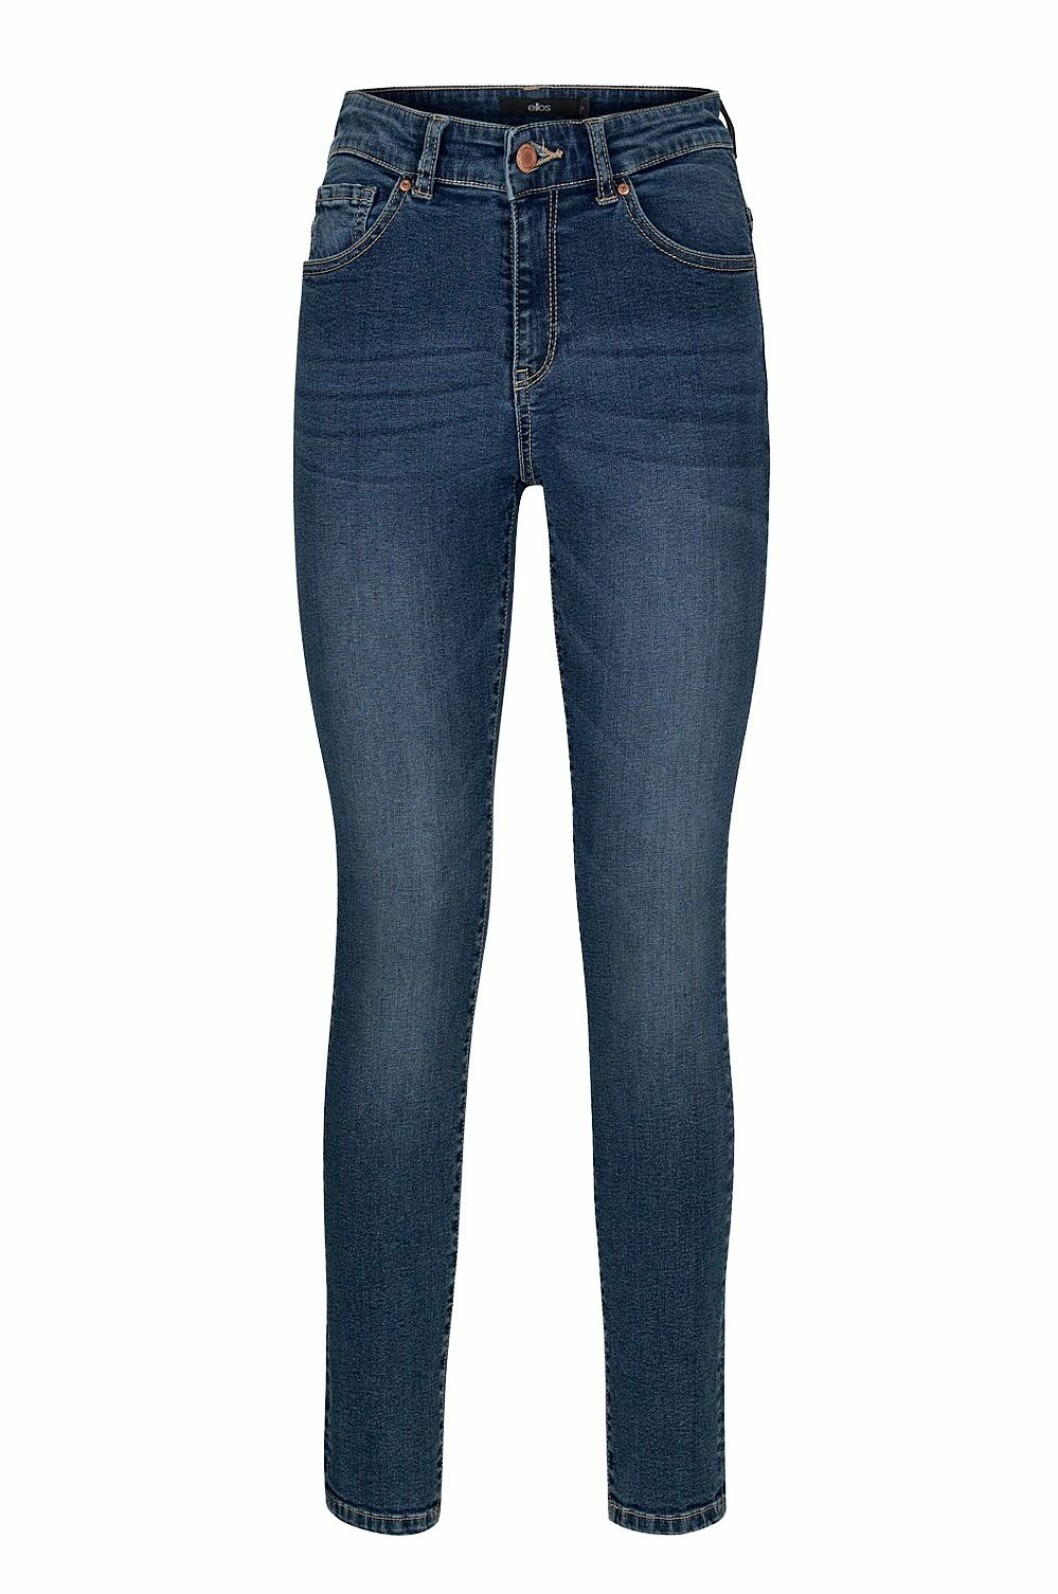 Jeans med smala ben